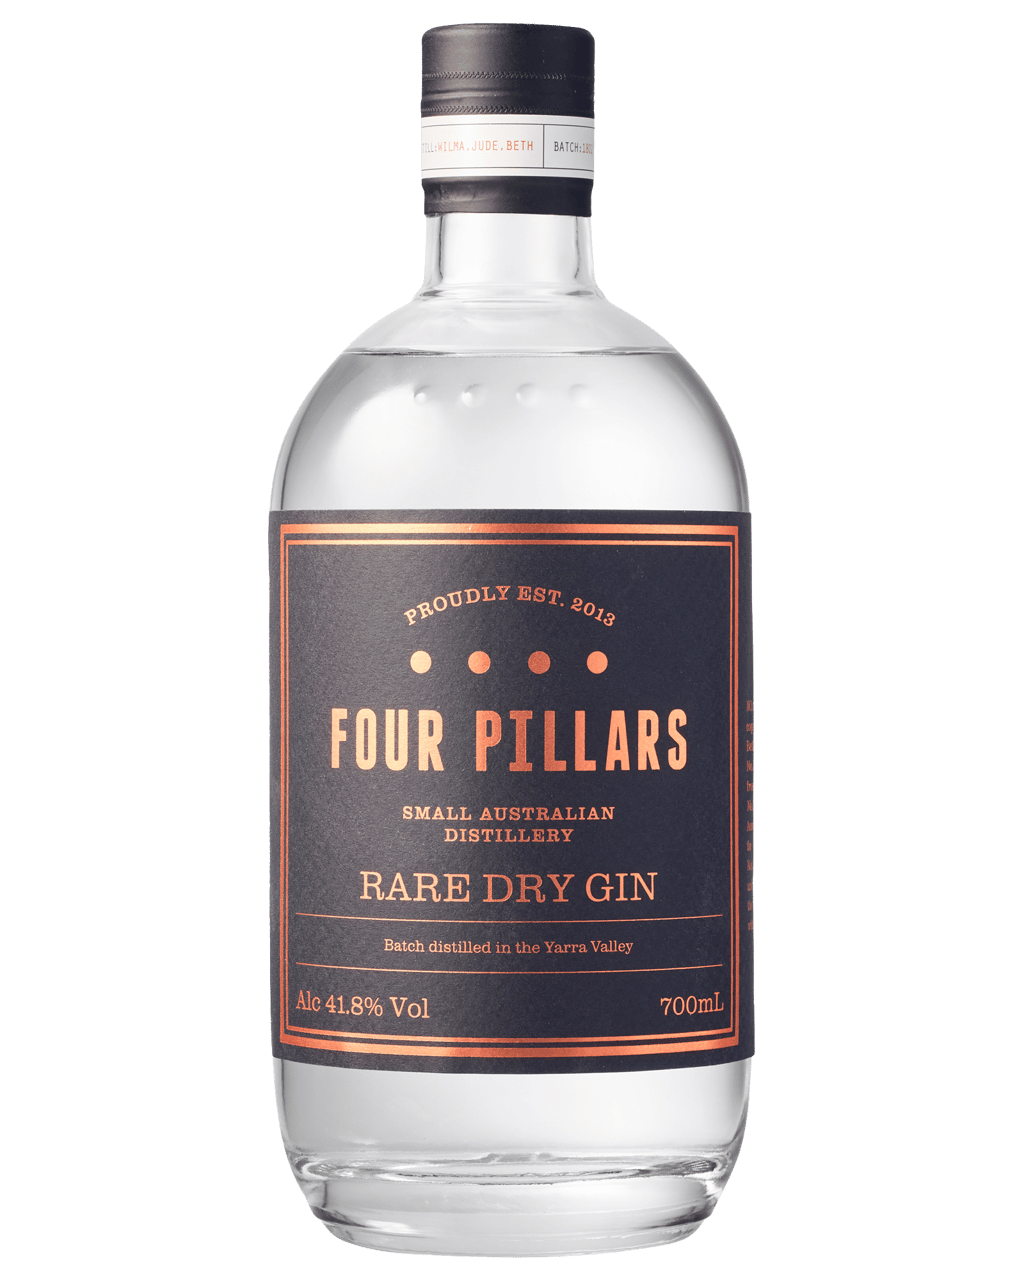 Buy Four Pillars Rare Dry Gin 700mL Online (Lowest prices in Australia) | Dan Murphy's